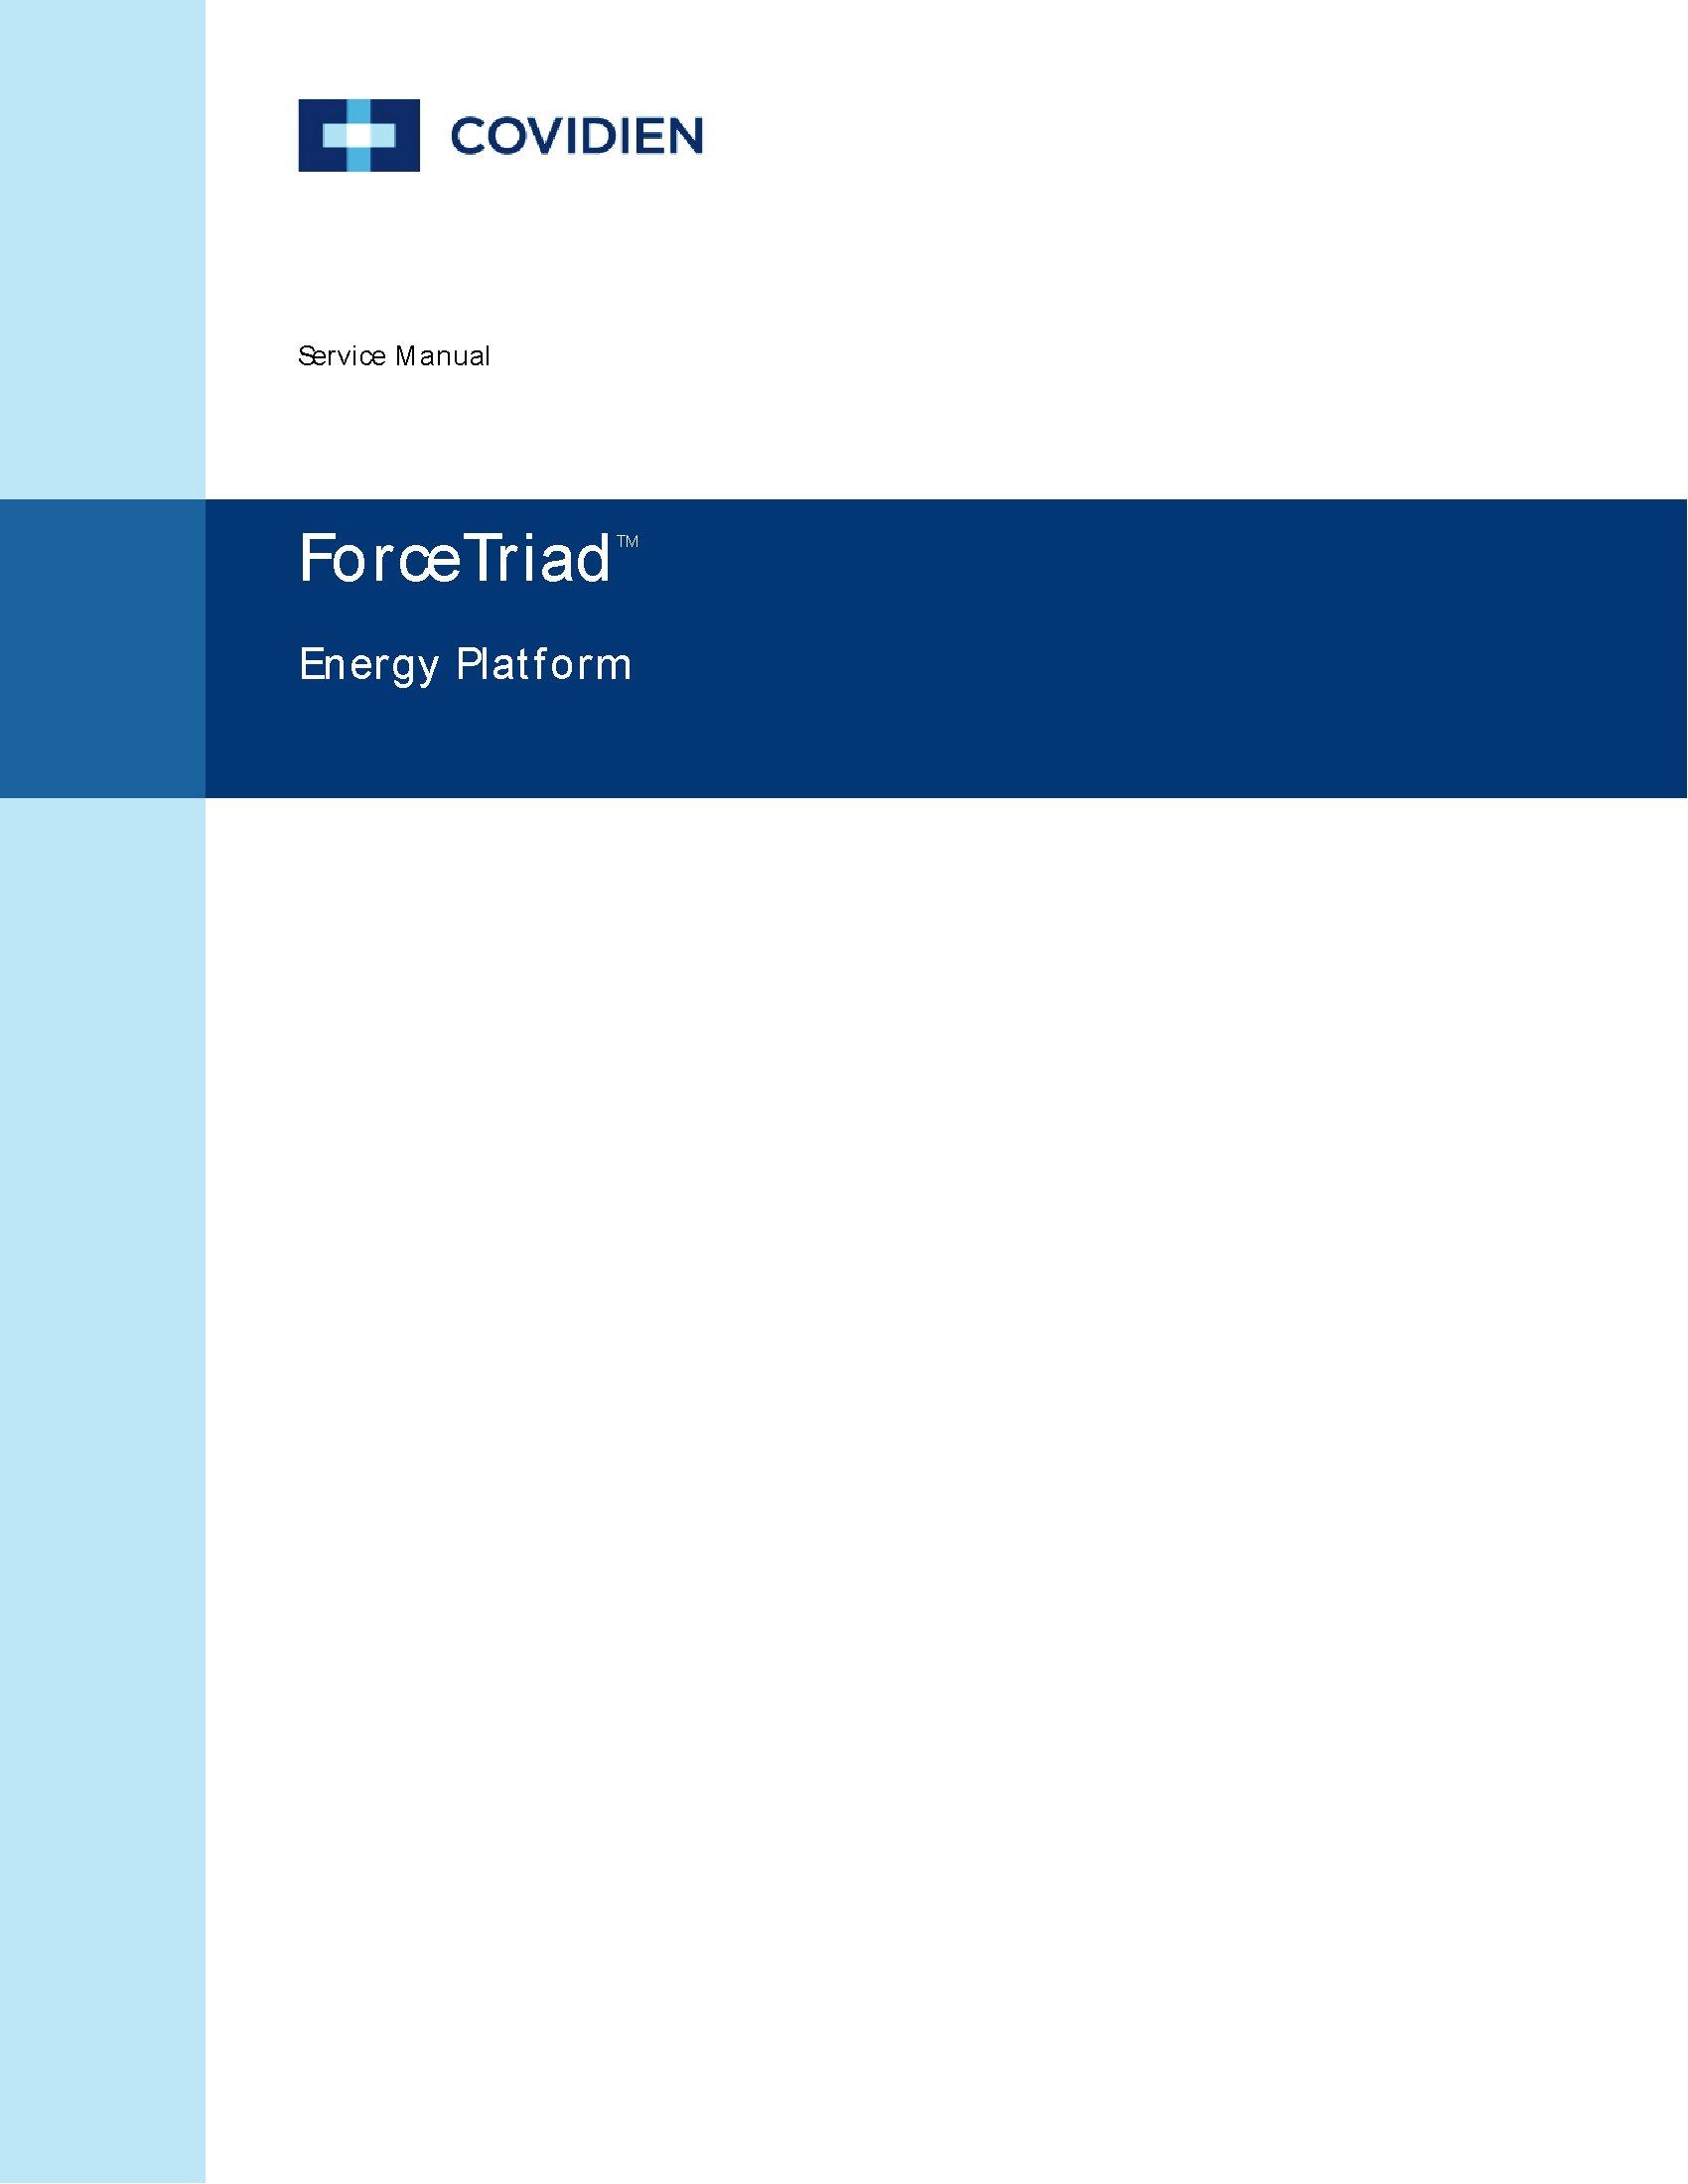 Covidien ForceTriad Service manual – Golden BioMed